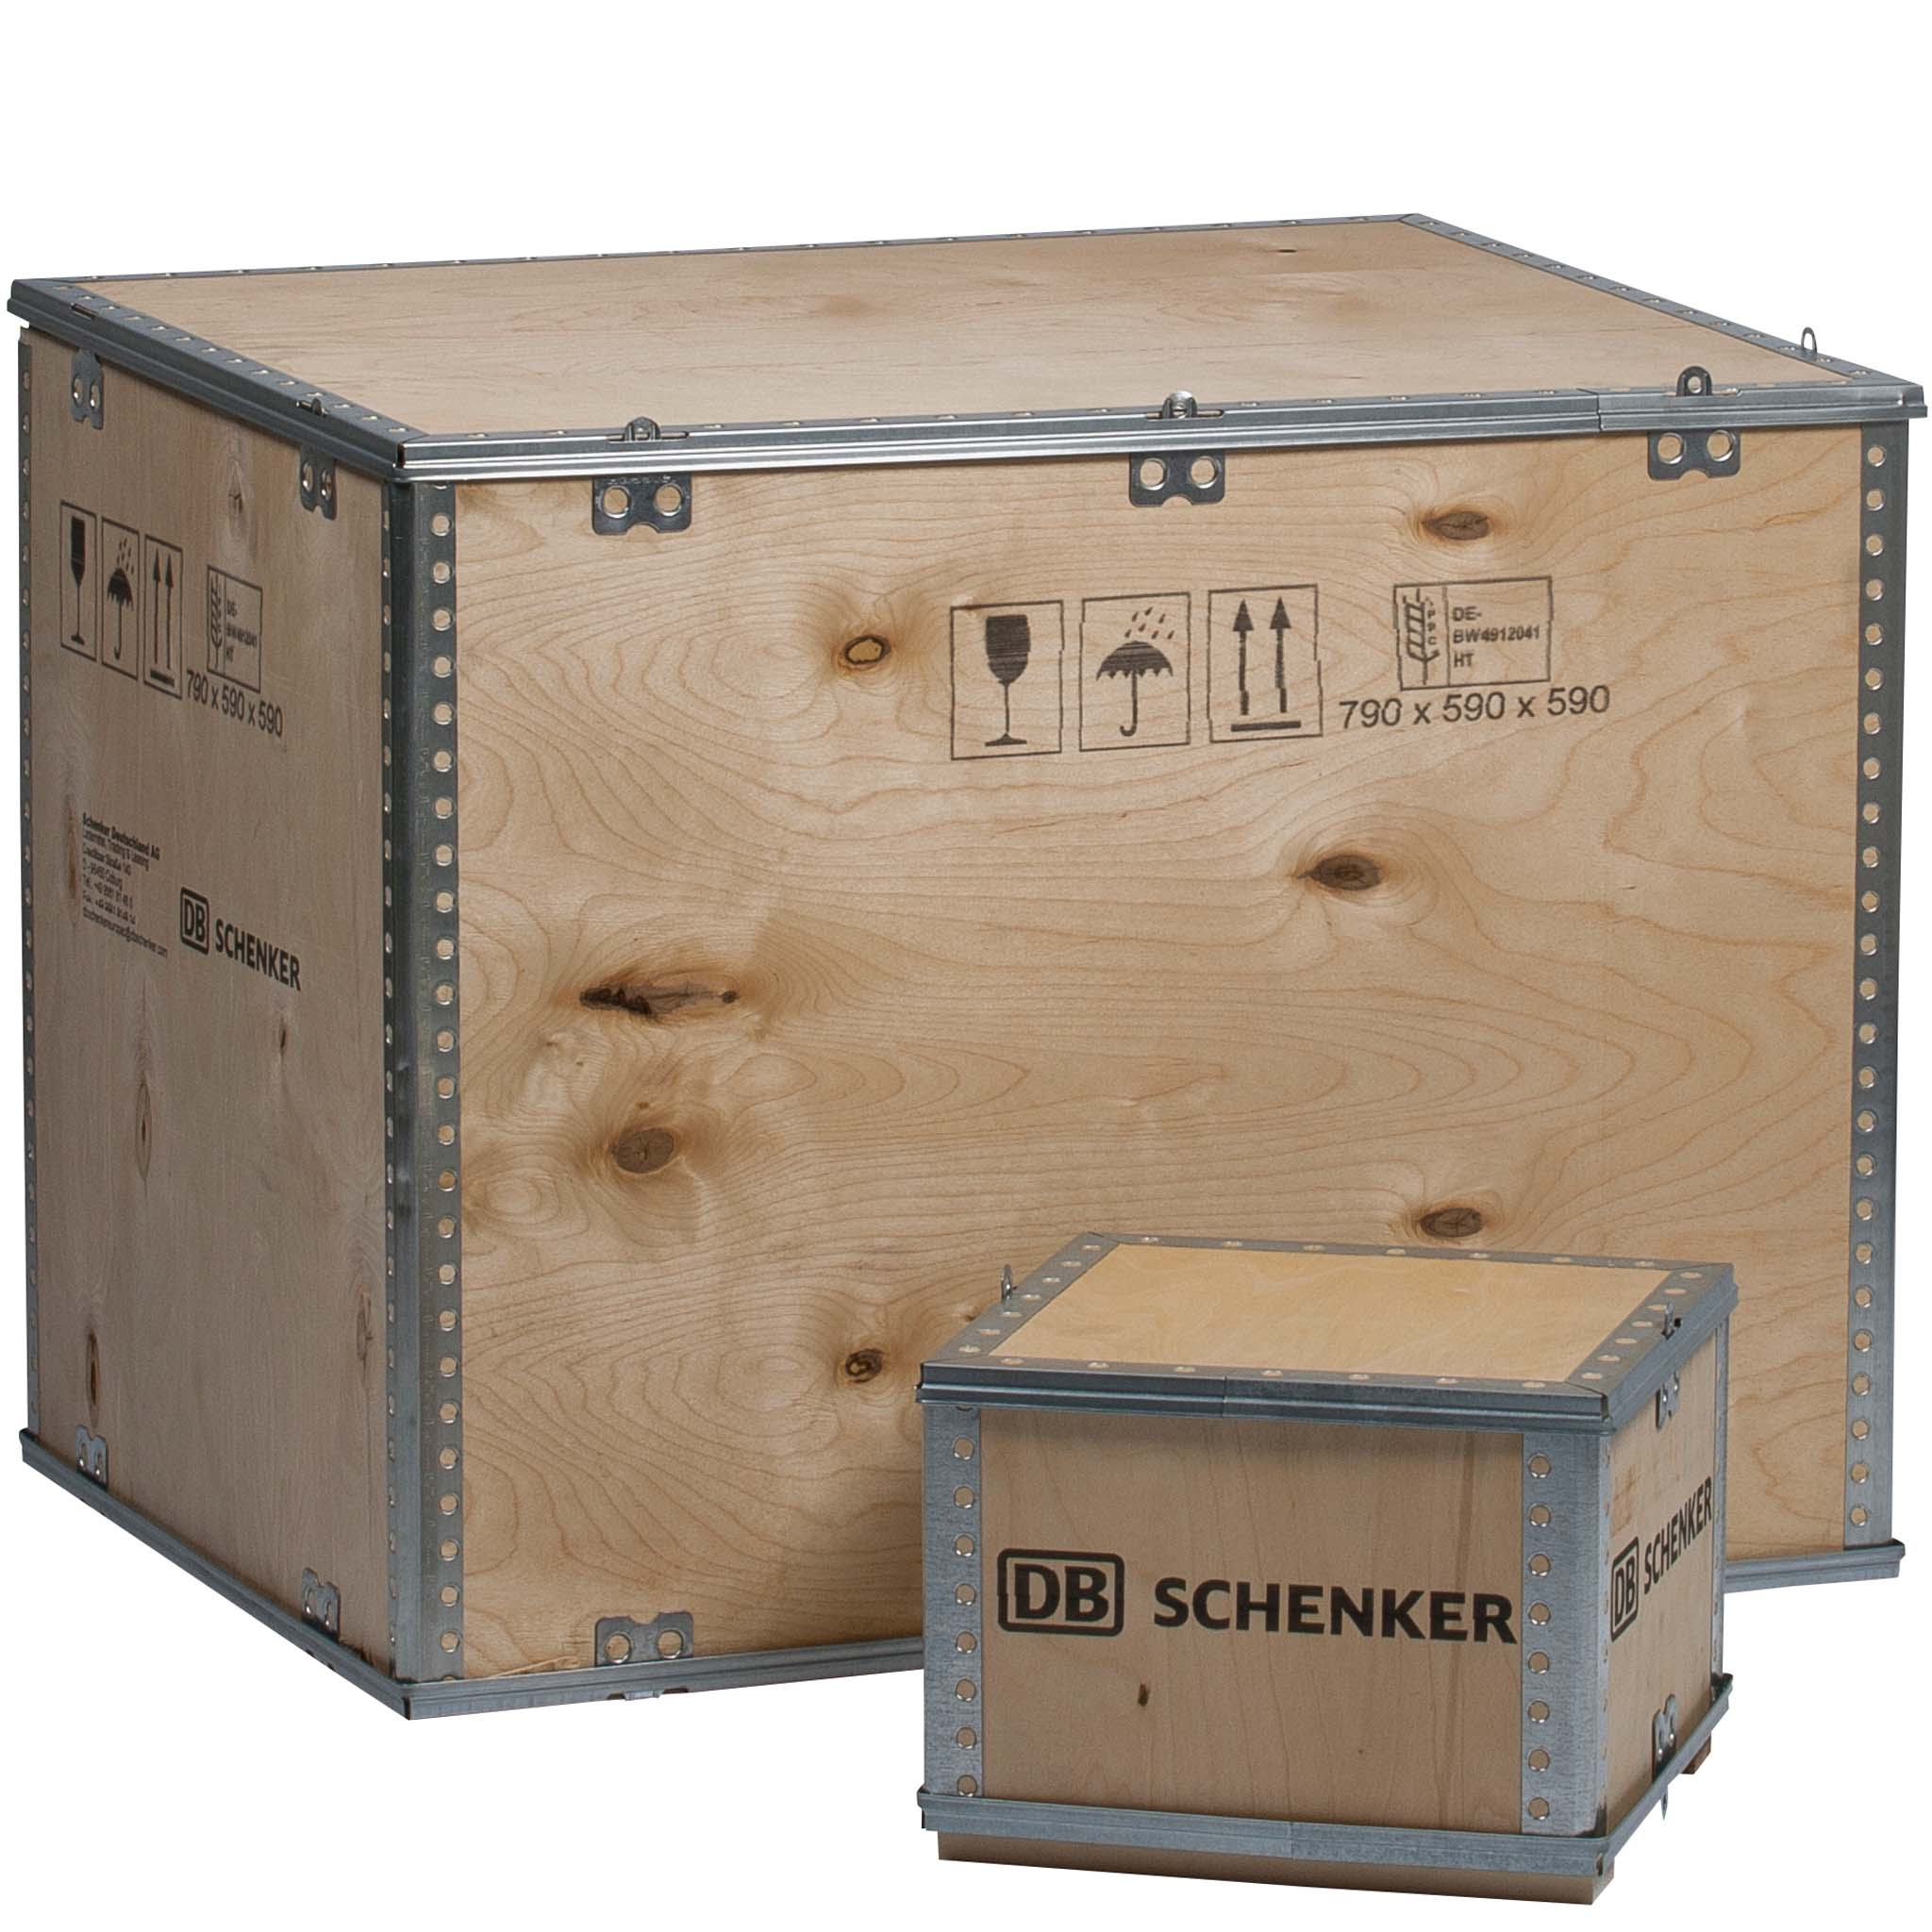 Cargo Boxen | 1.200 X 1.000 mm Innenmaß 1.180 x 980 x 990 mm